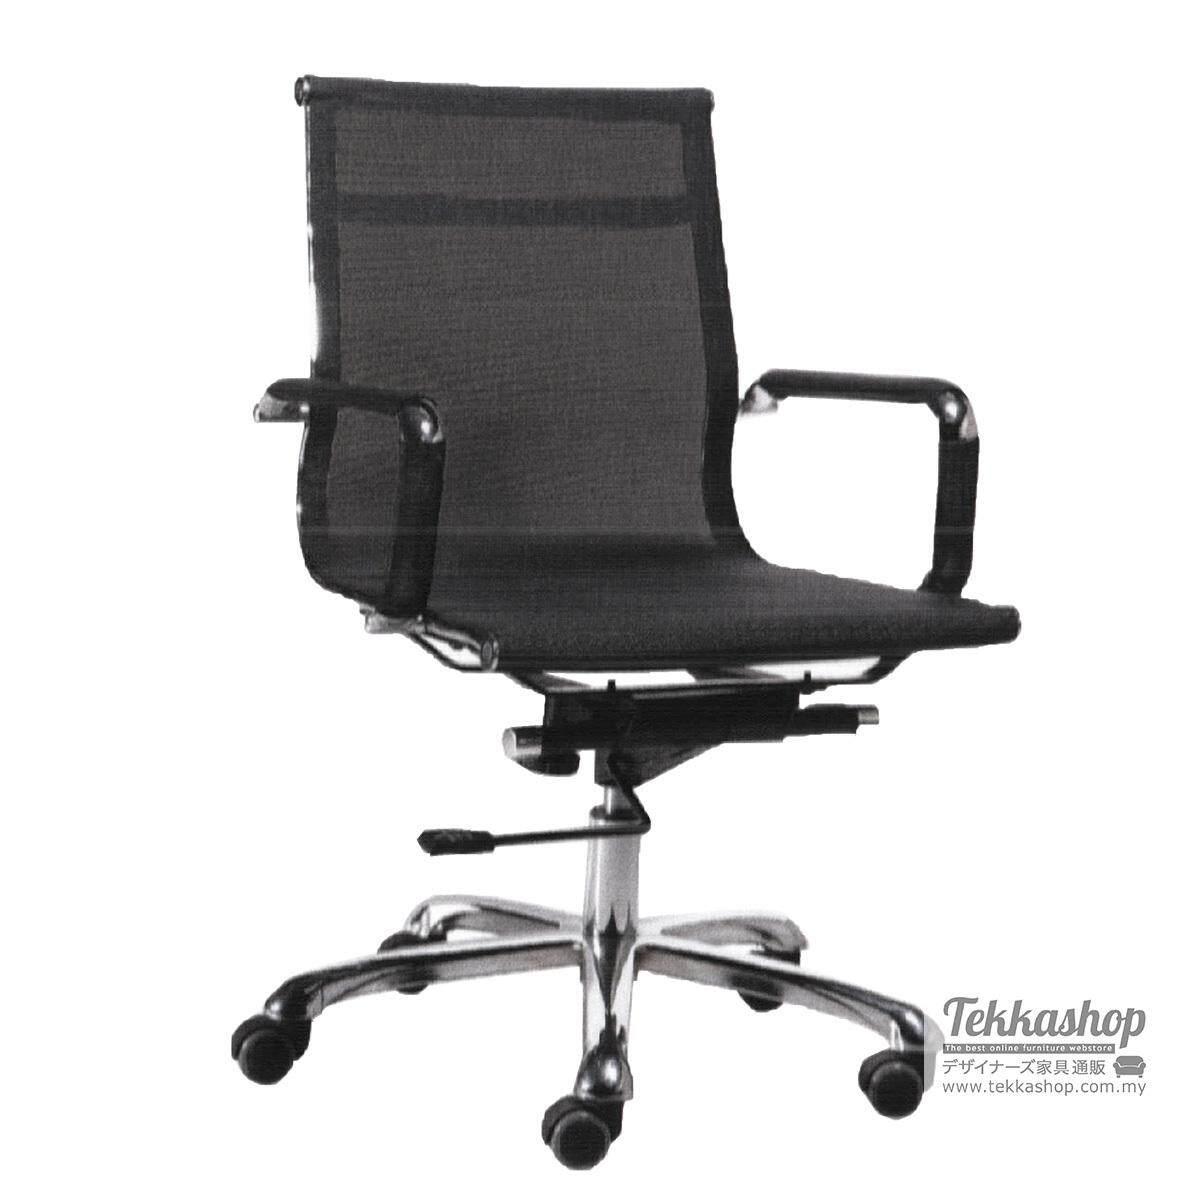 comfortable home office chair. Tekkashop KKMJC0Y Adjustable Seat Height Ergonomic Swivel Mesh Comfortable Home Office Chair, High Back Chair